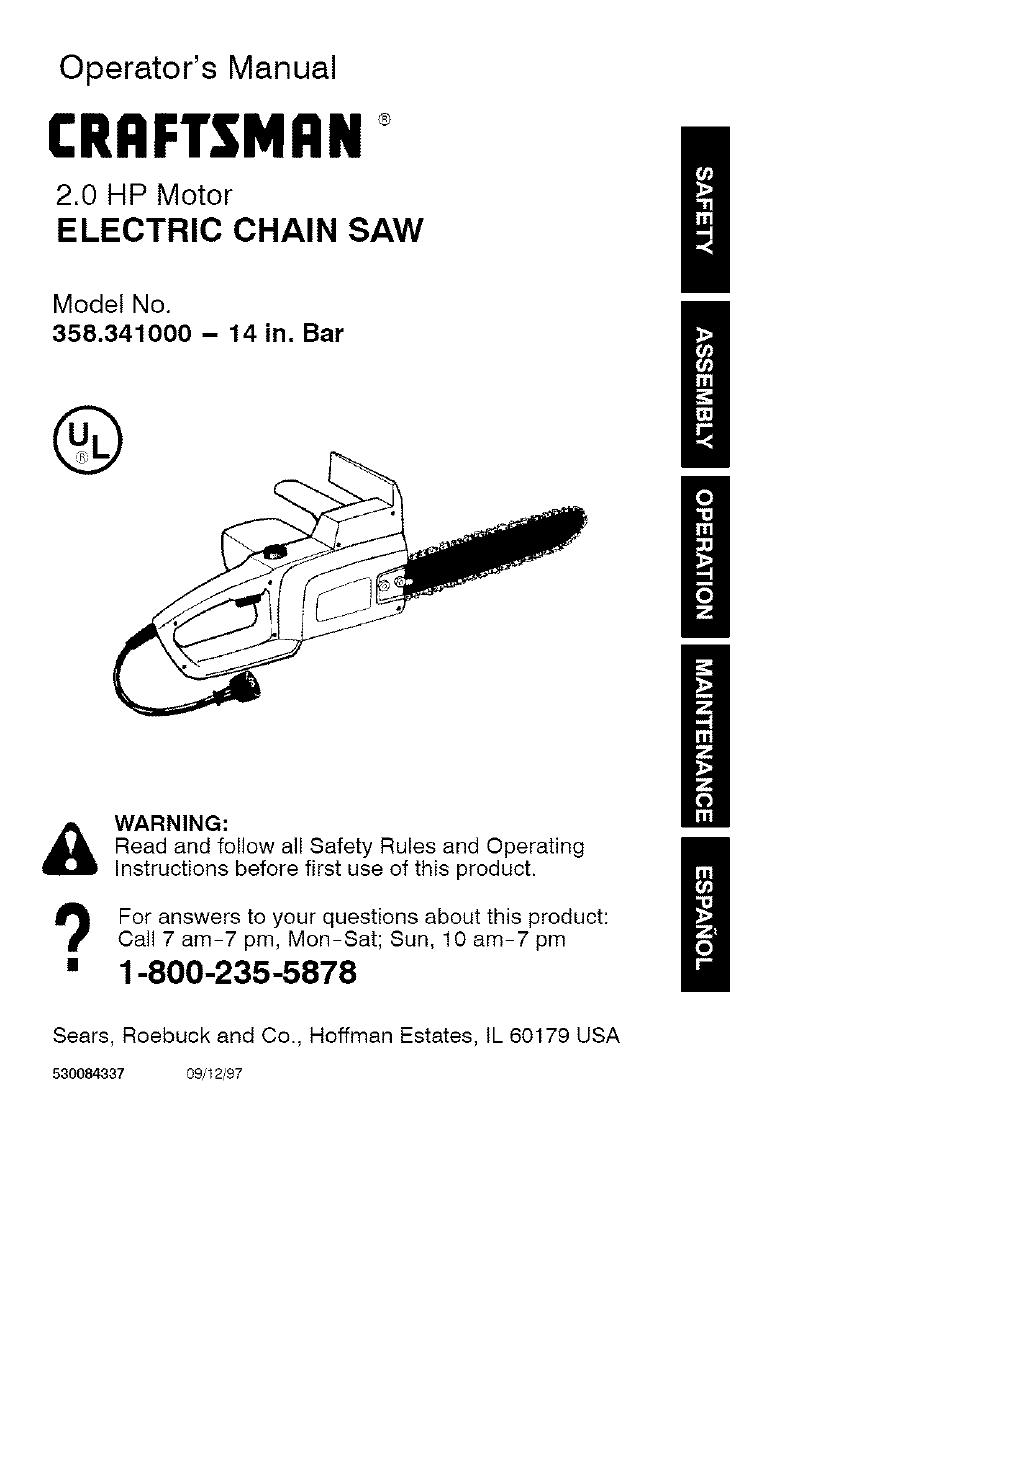 Craftsman Chainsaw Wiring Diagram Electrical Diagrams Of Owners Manual 358 350440 Open Source User U2022 Carburetor Model